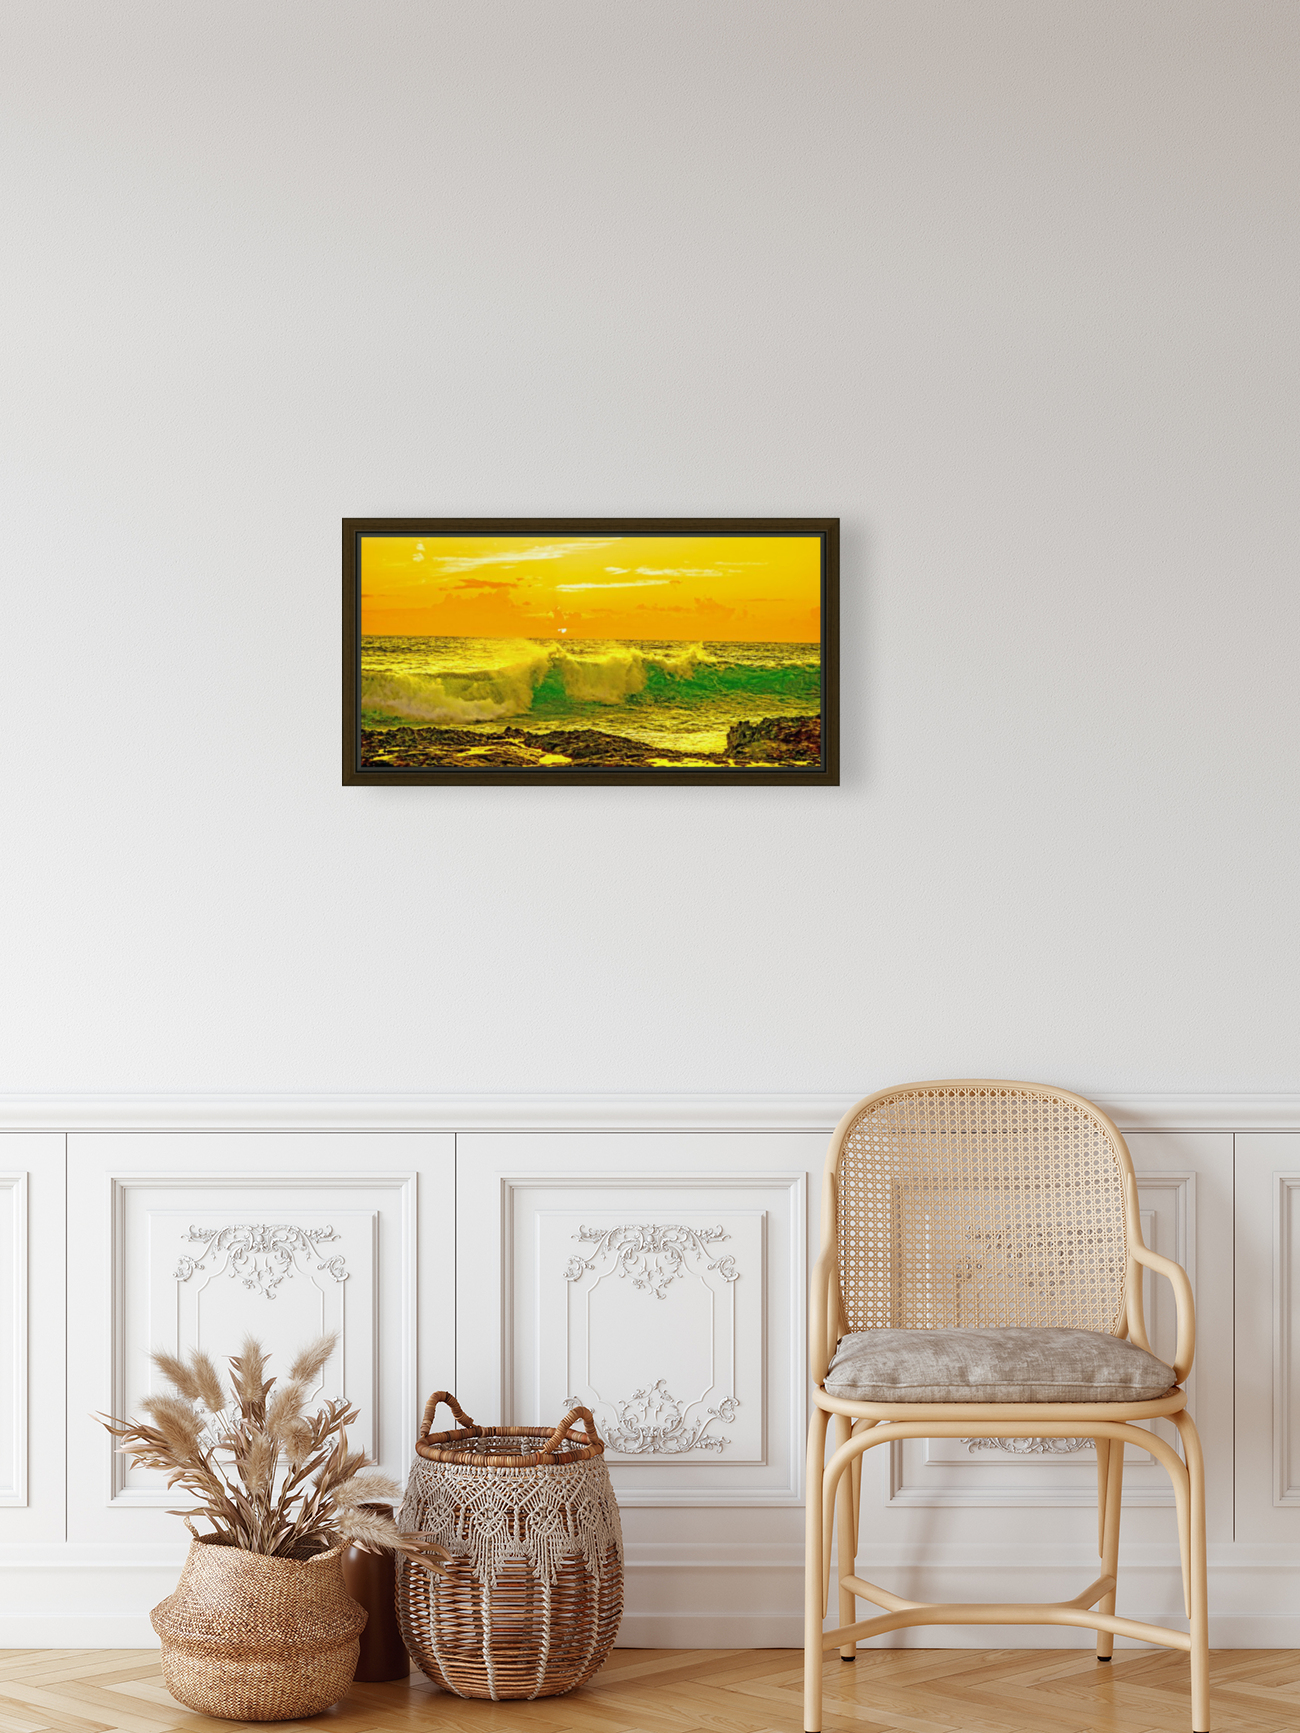 At the Sea Shore Panorama - Sunset Hawaiian Islands  Art